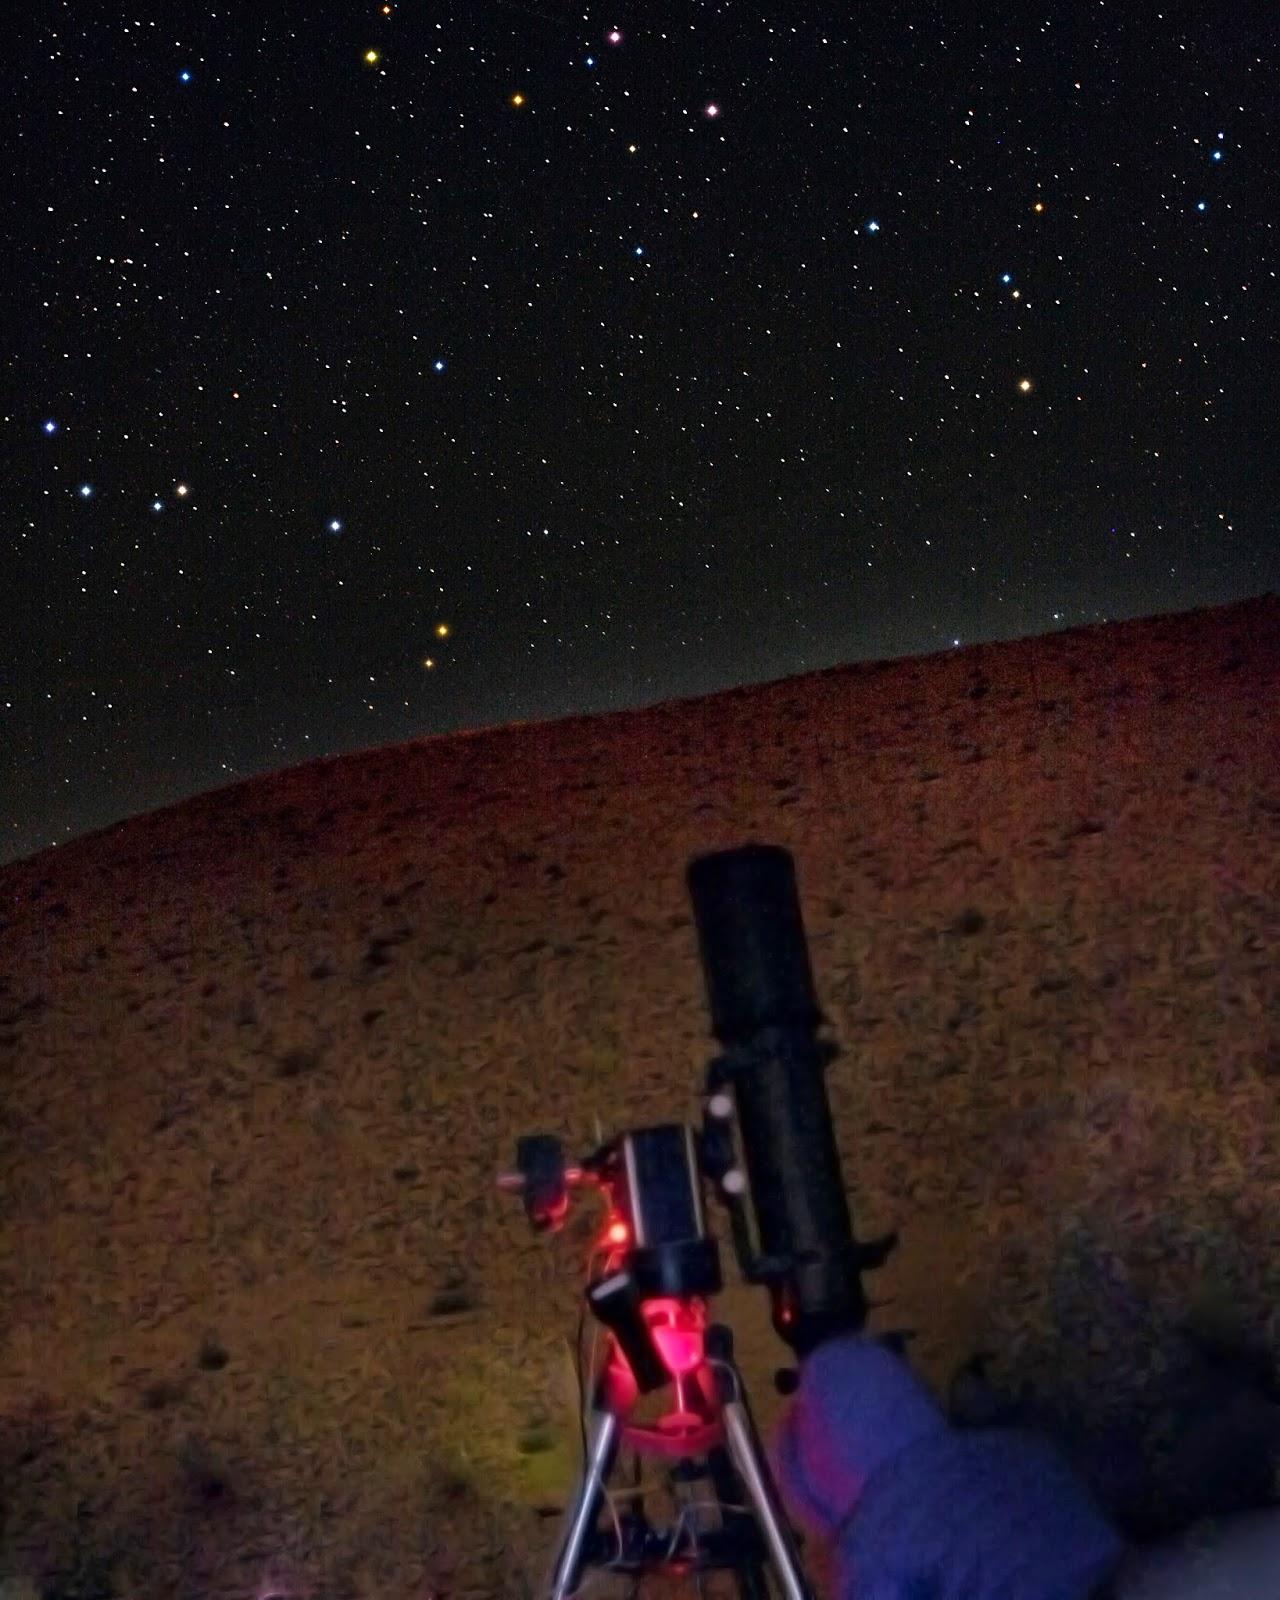 Astrophotography Blog: February 2014